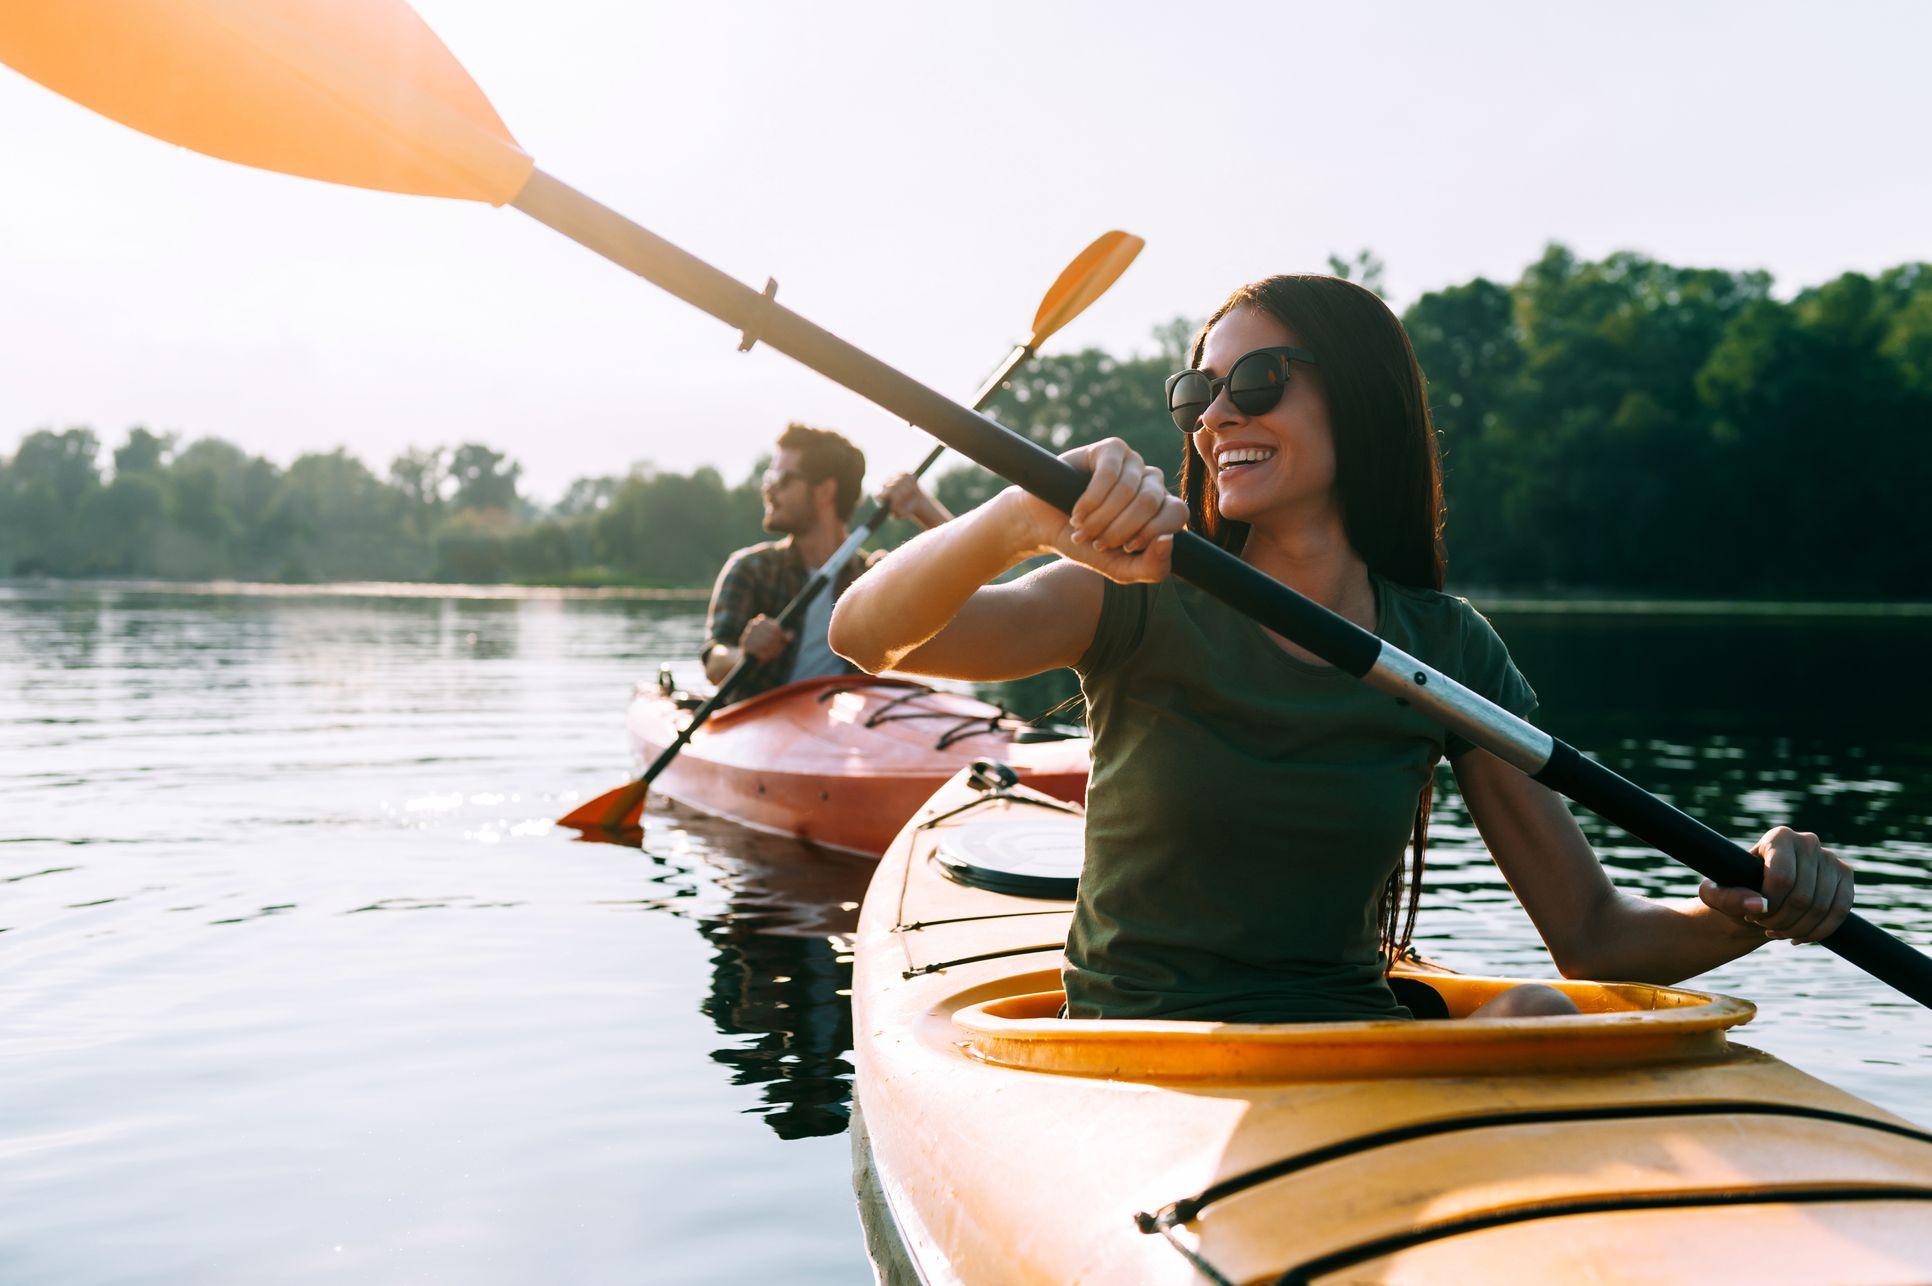 Kayaking on Indigo Lake:Kayaking on Indigo Lake